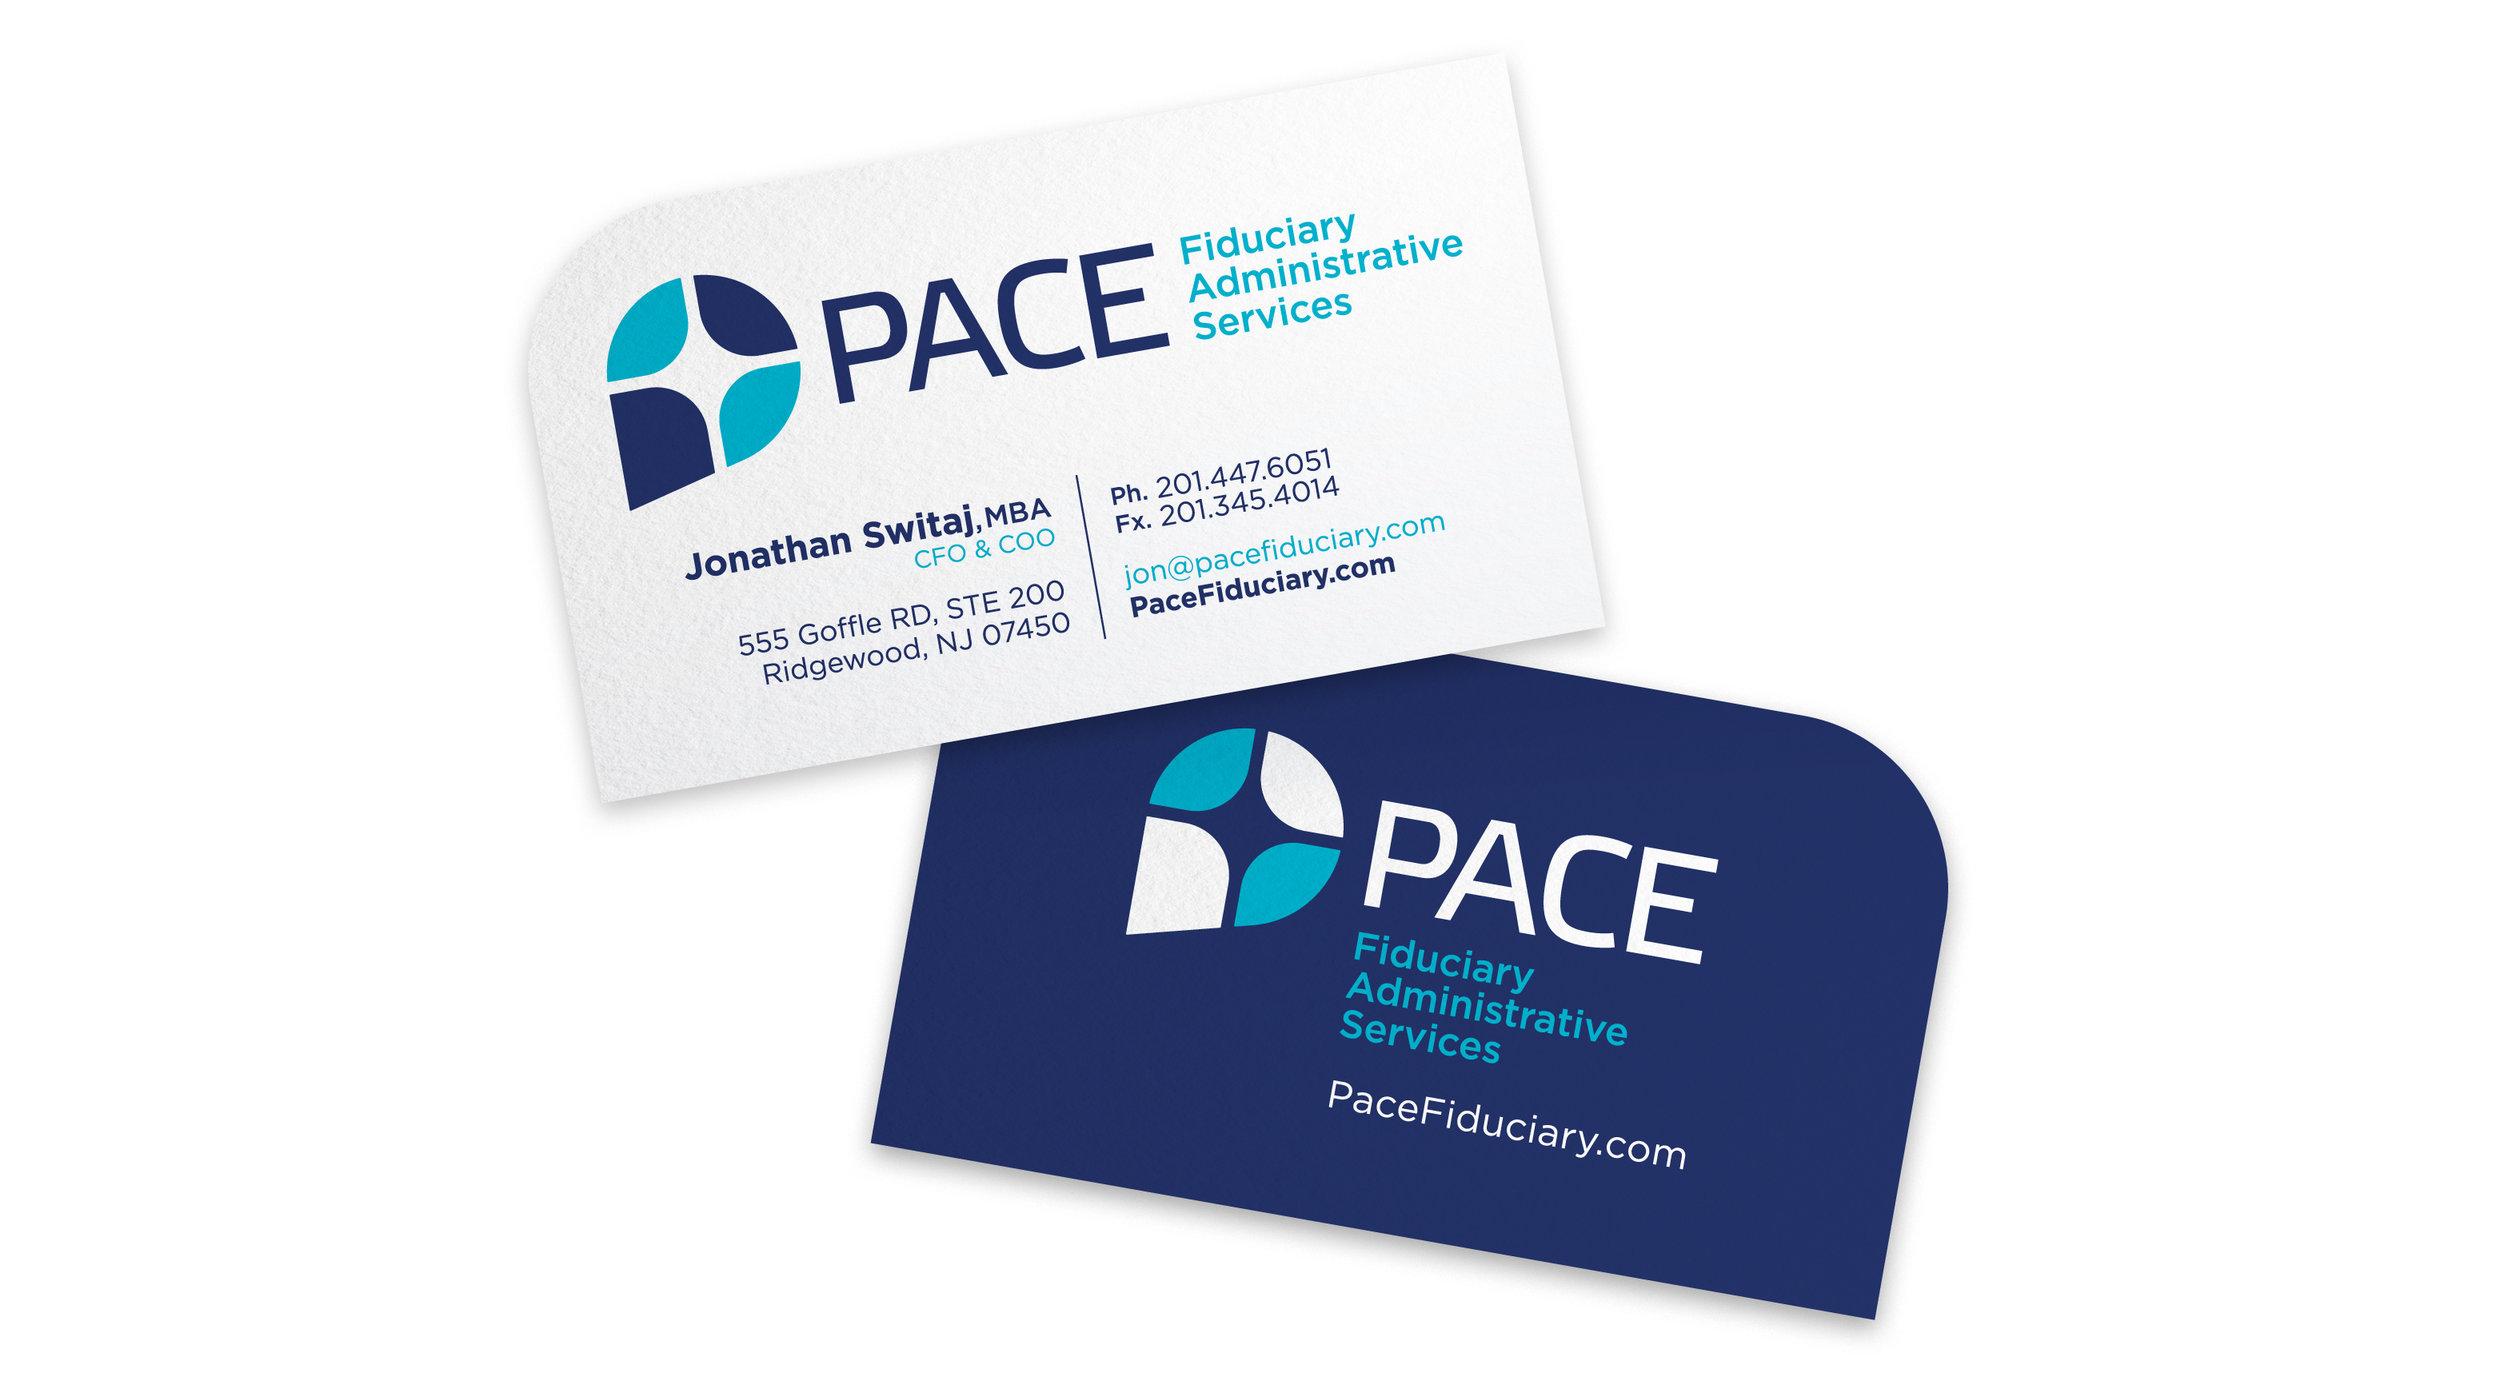 Pace4.jpg